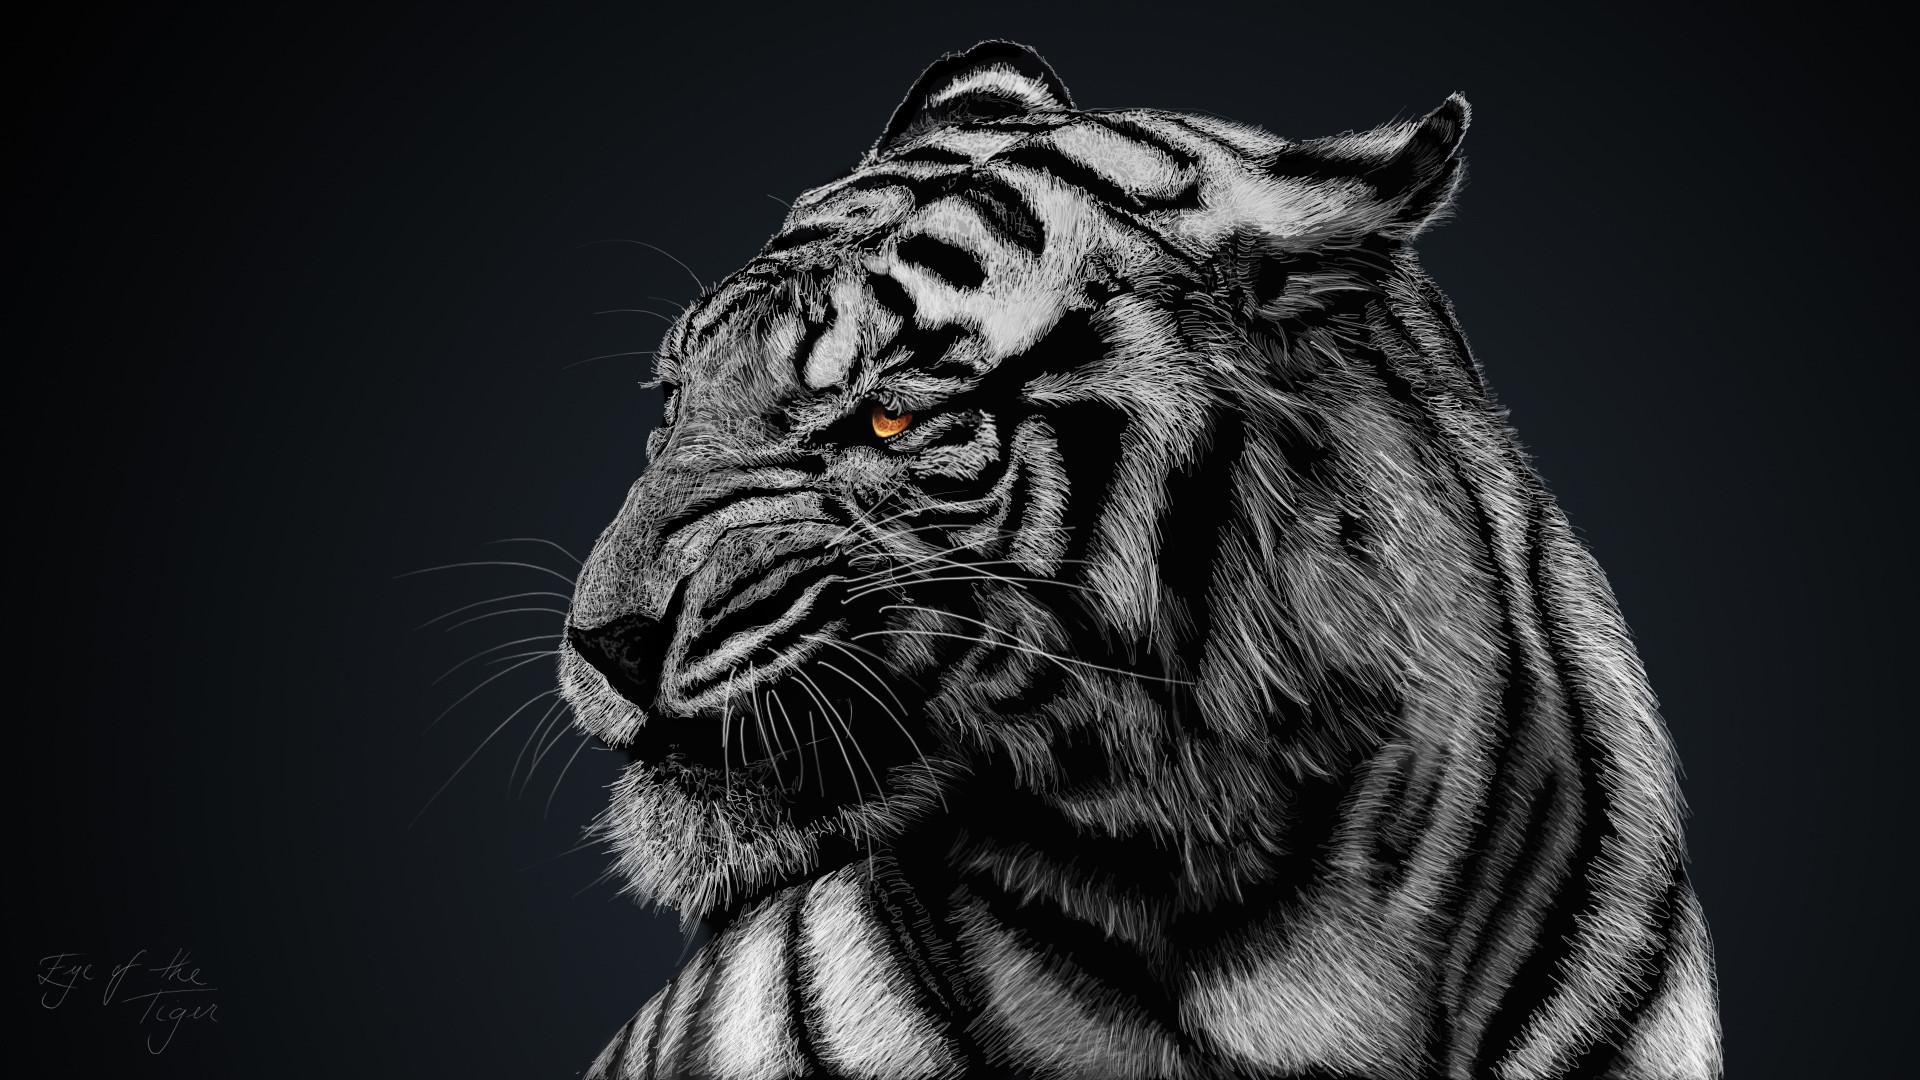 8k Animal Wallpaper Download: Cool Tiger Wallpapers ·① WallpaperTag